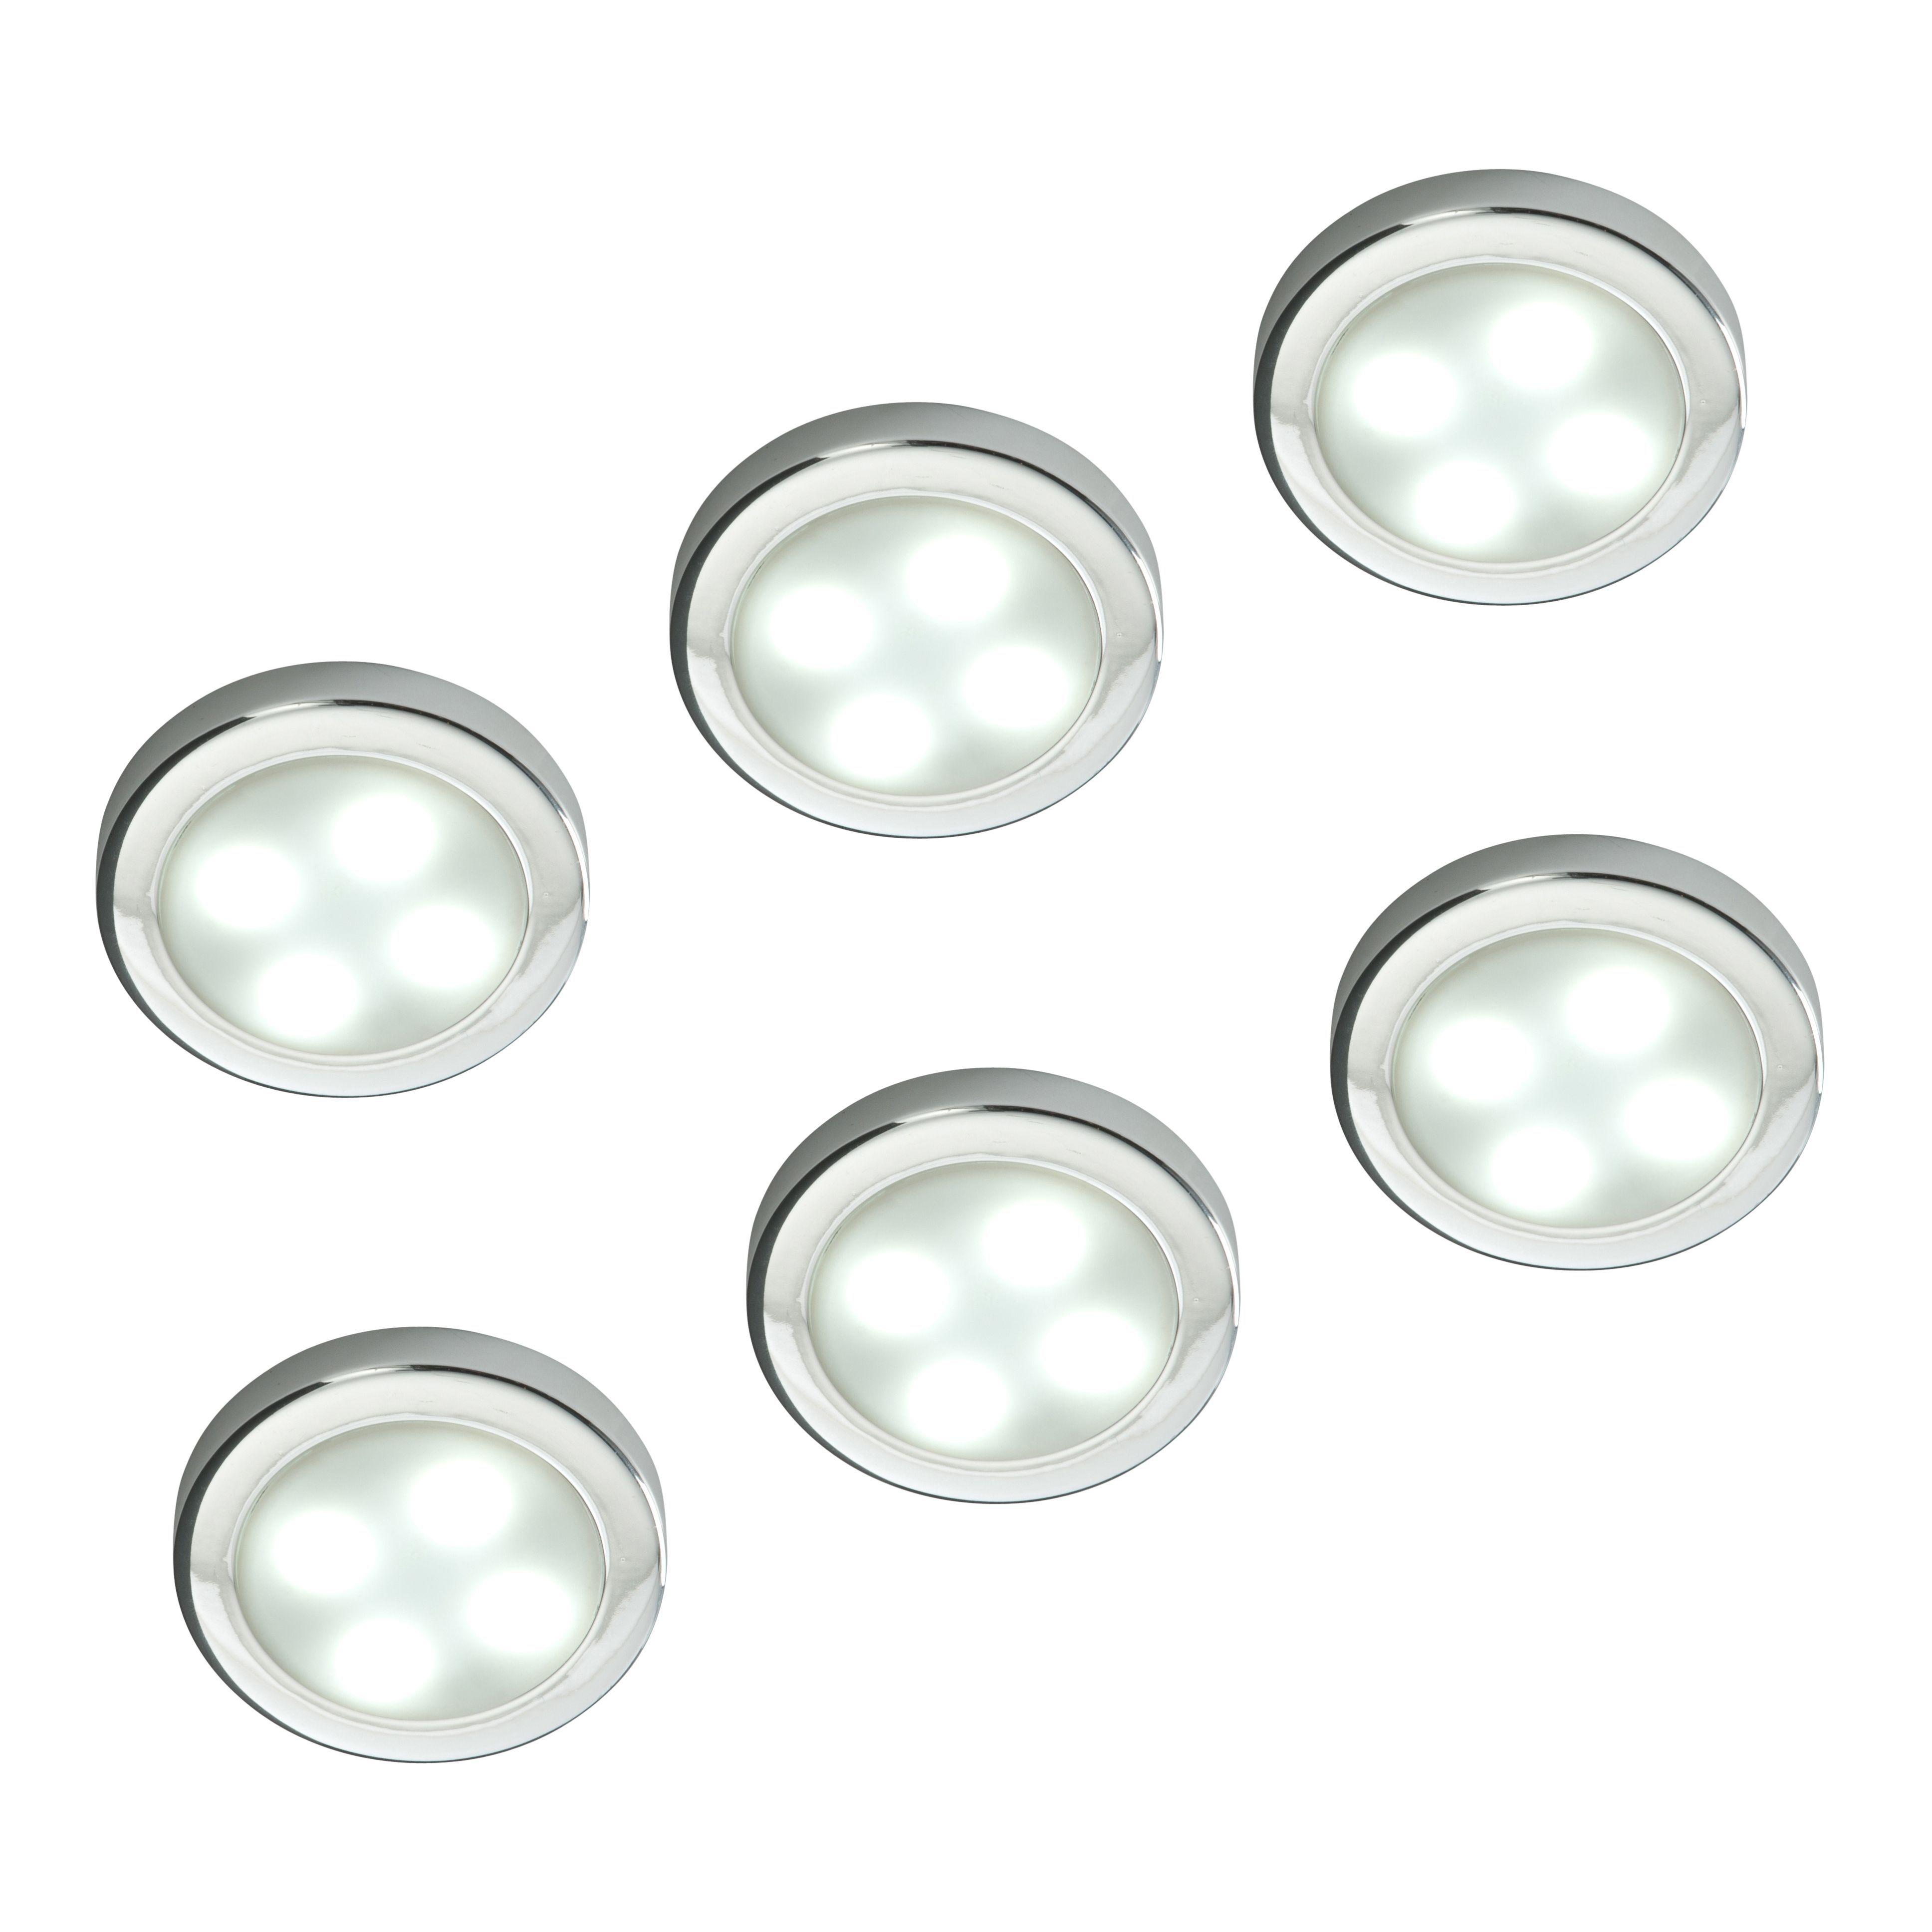 Masterlite Mains Powered Led Cabinet Light Pack Of 3: Masterlite Mains Powered LED Cabinet Light, Pack Of 6